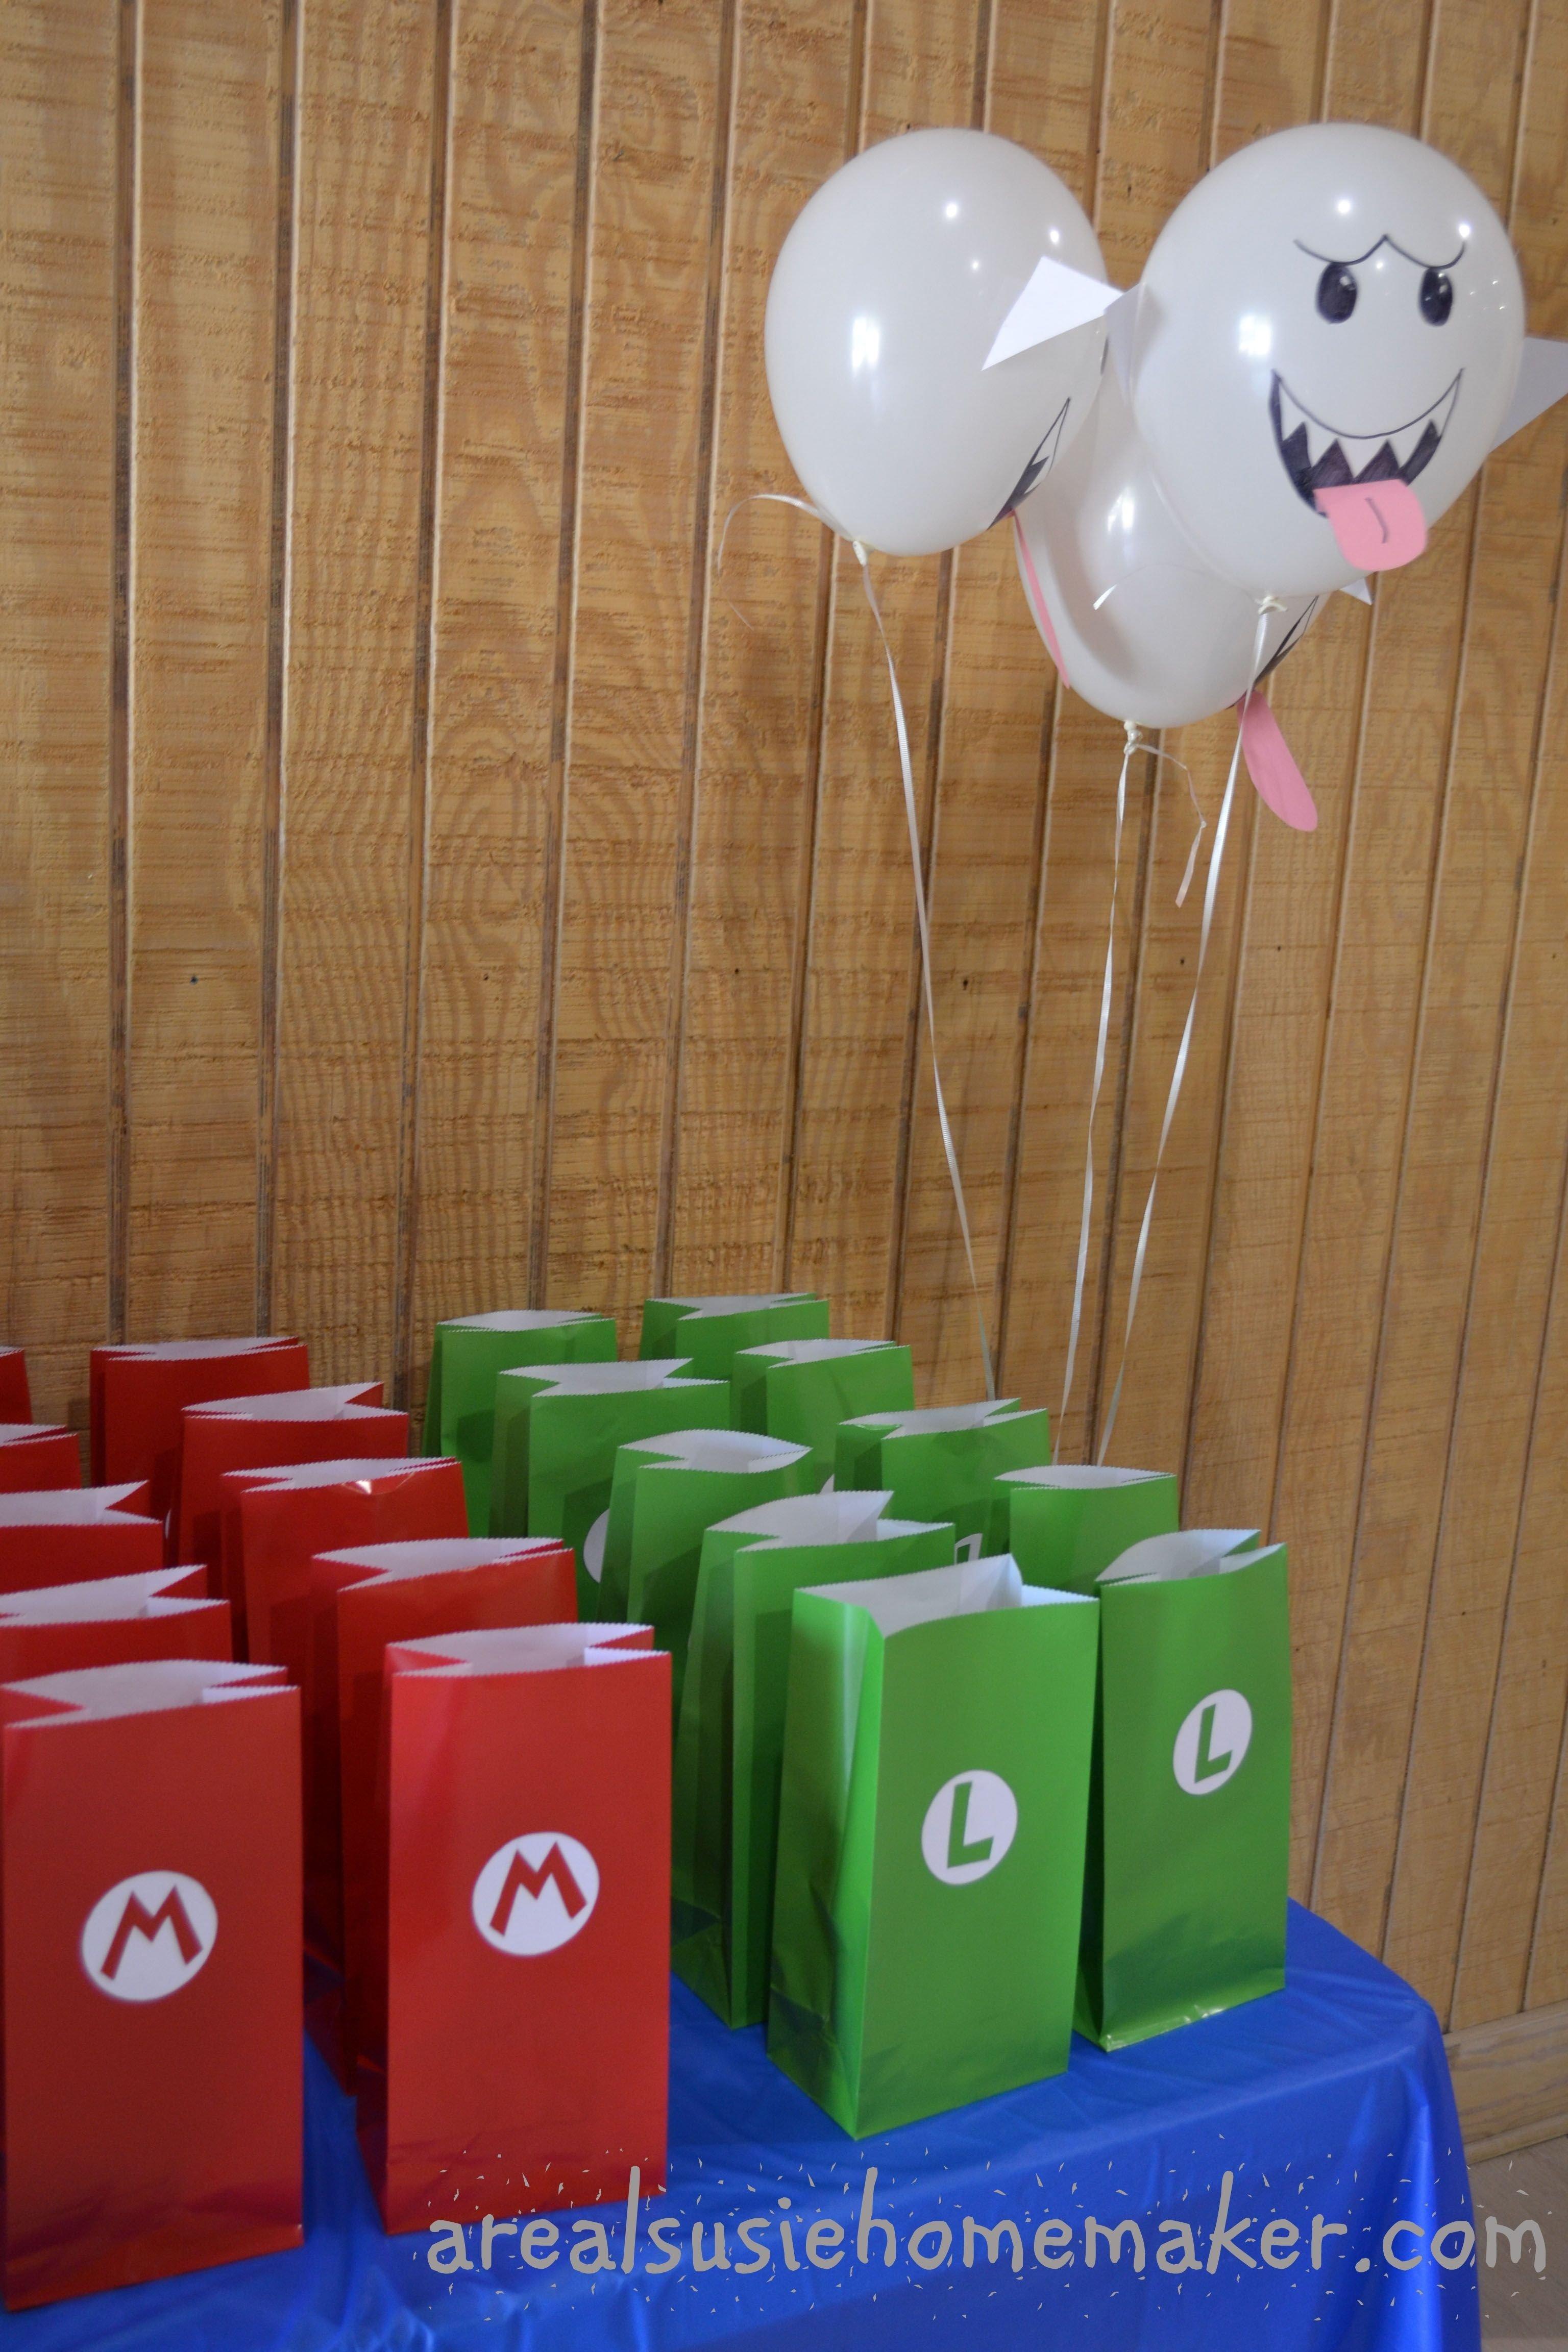 10 Fabulous Super Mario Brothers Birthday Party Ideas super mario bros birthday party ideas super mario bros birthday 2020